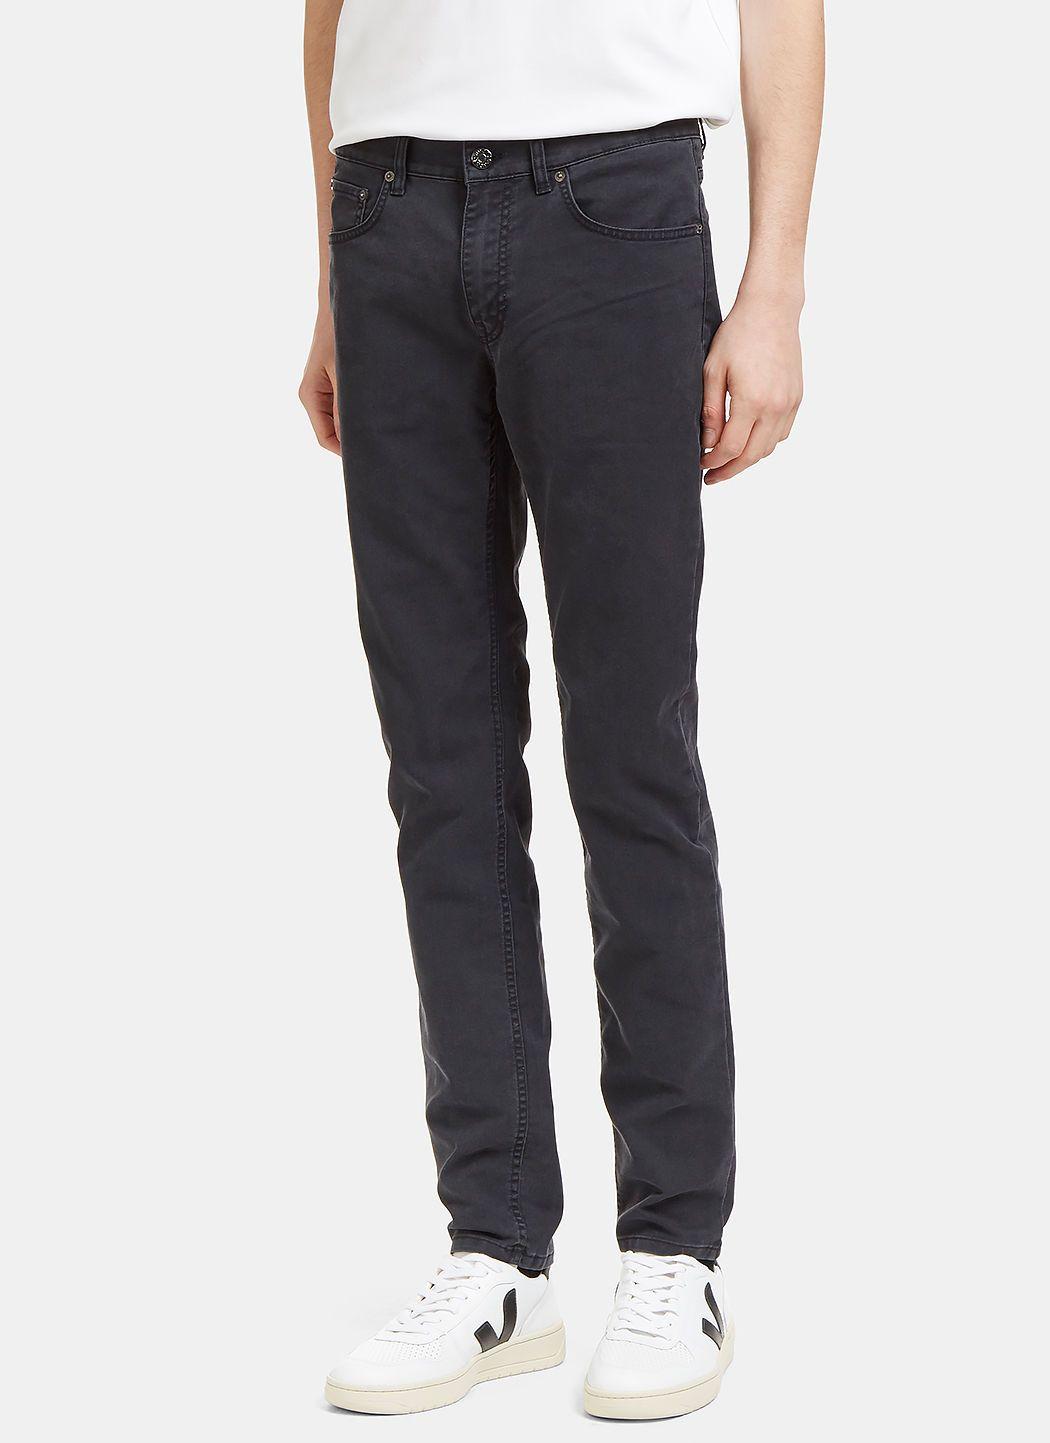 ACNE STUDIOS Men s Ace Ups Skinny Leg Jeans in Charcoal.  acnestudios   cloth   b1e912ff88a